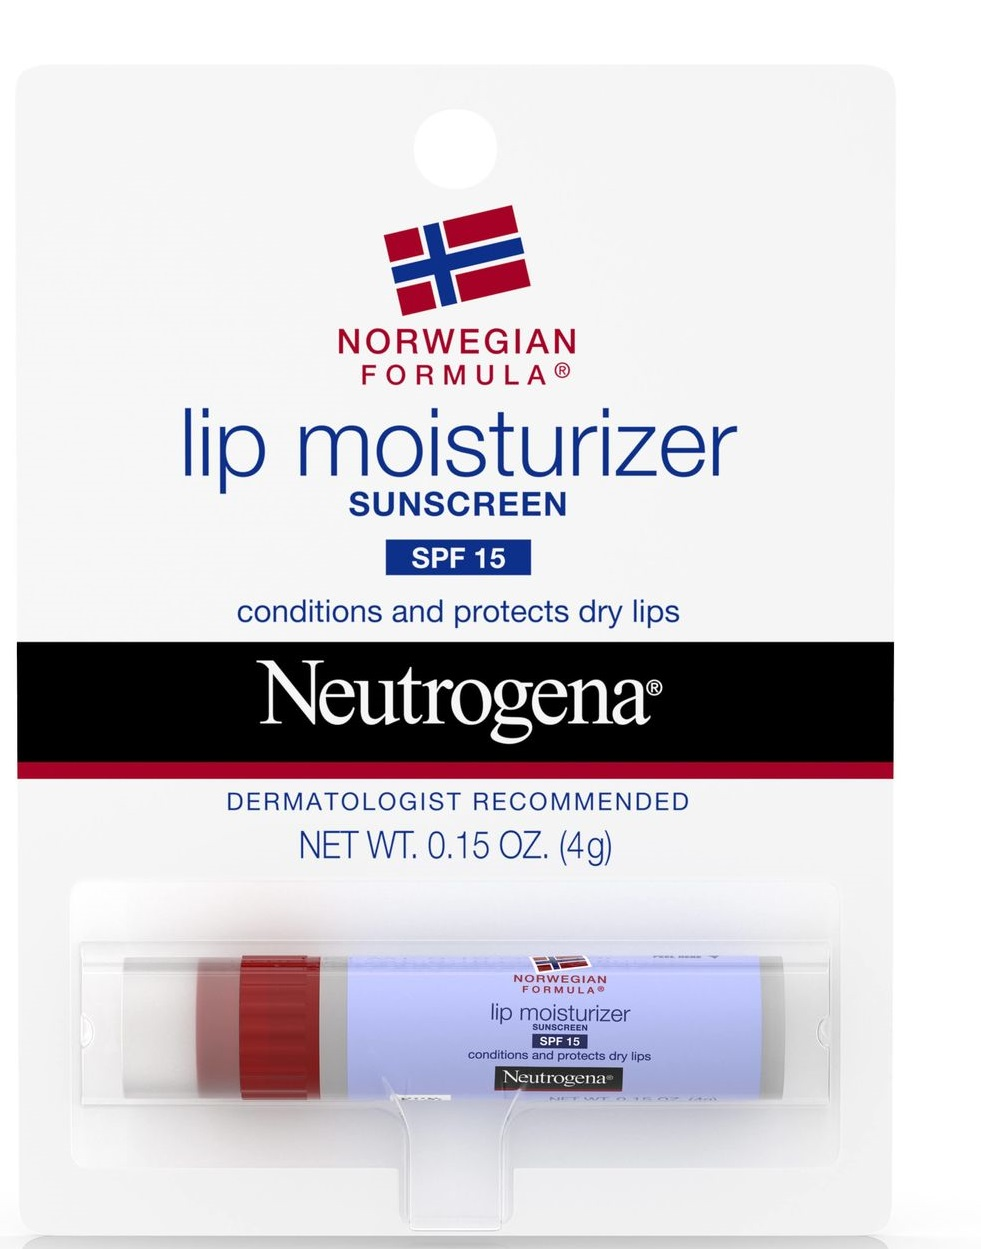 Neutrogena® Norwegian Formula® Lip Moisturizer with Sunscreen SPF 15